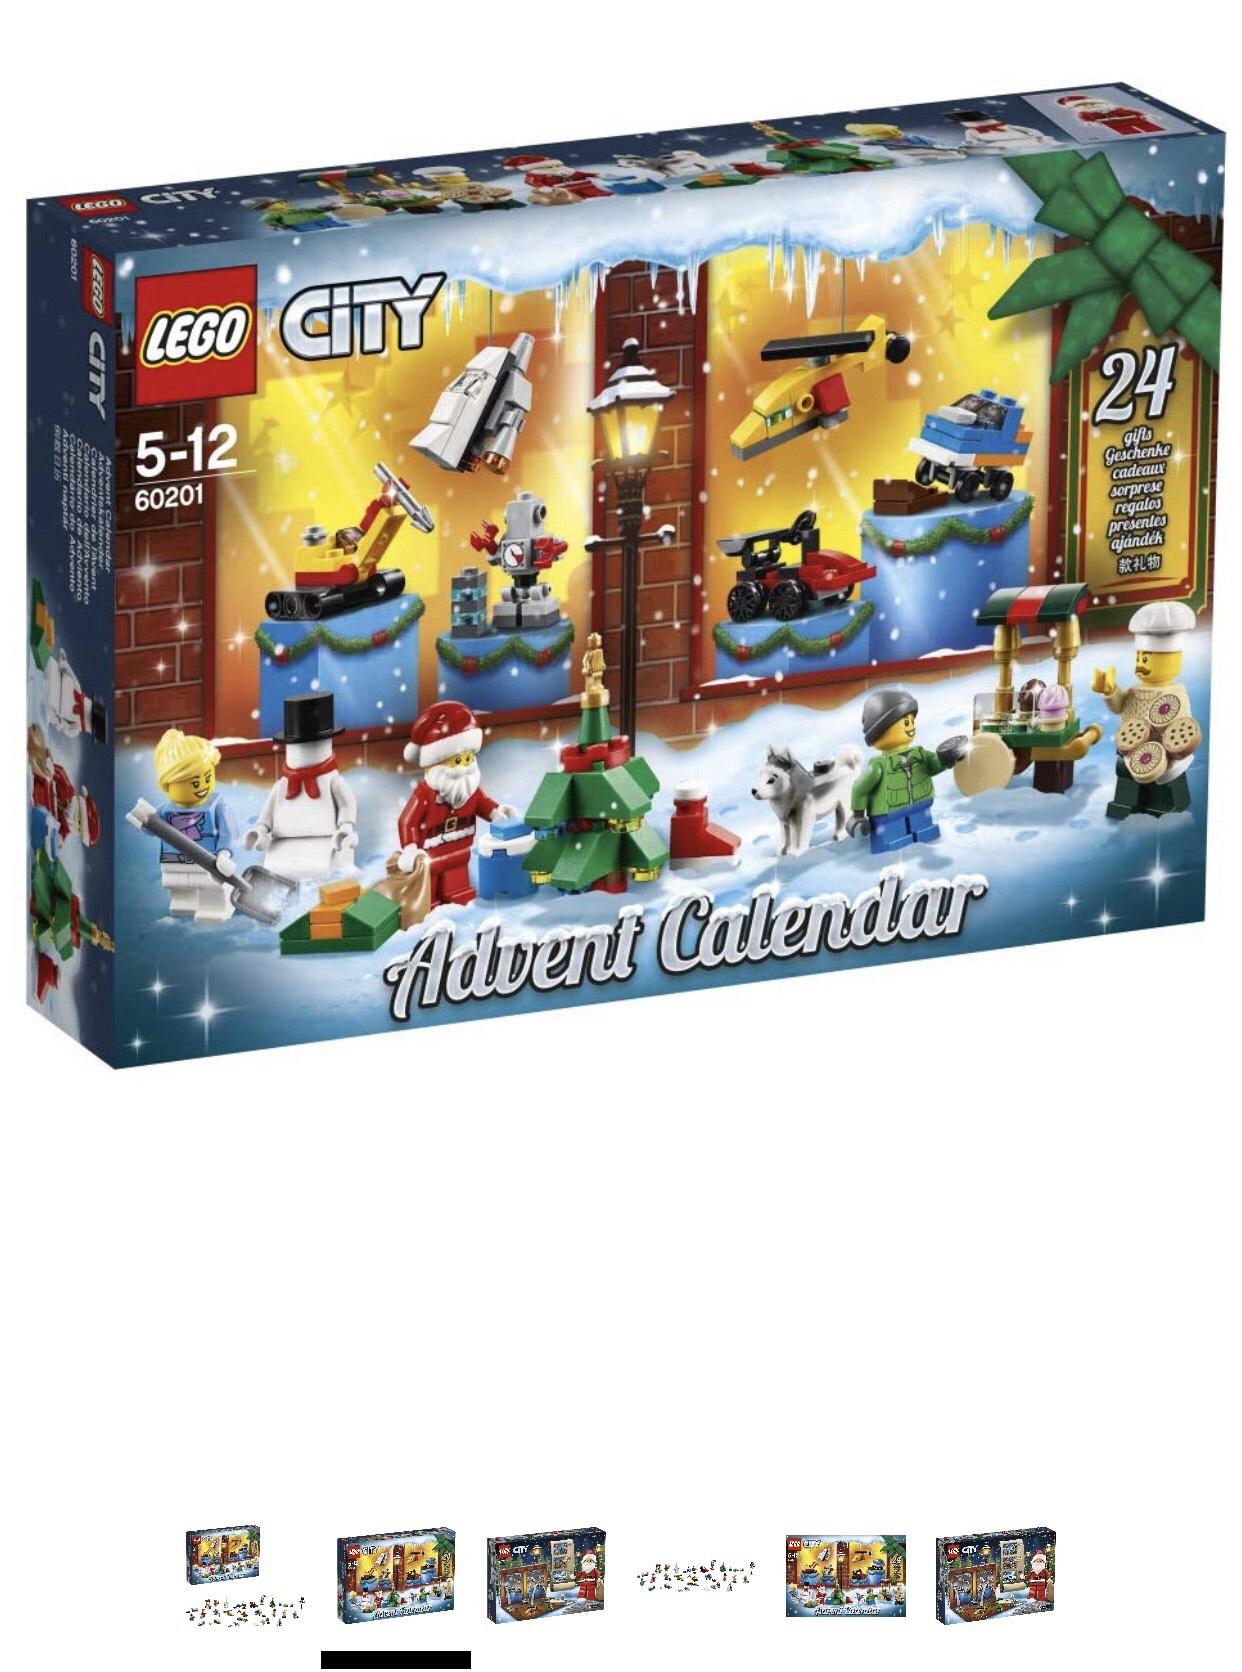 Lego 60201  City / Lego 41353  Friends 2018 Advent Calendar £16.71 (Prime) / £21.20 (non Prime)  Amazon